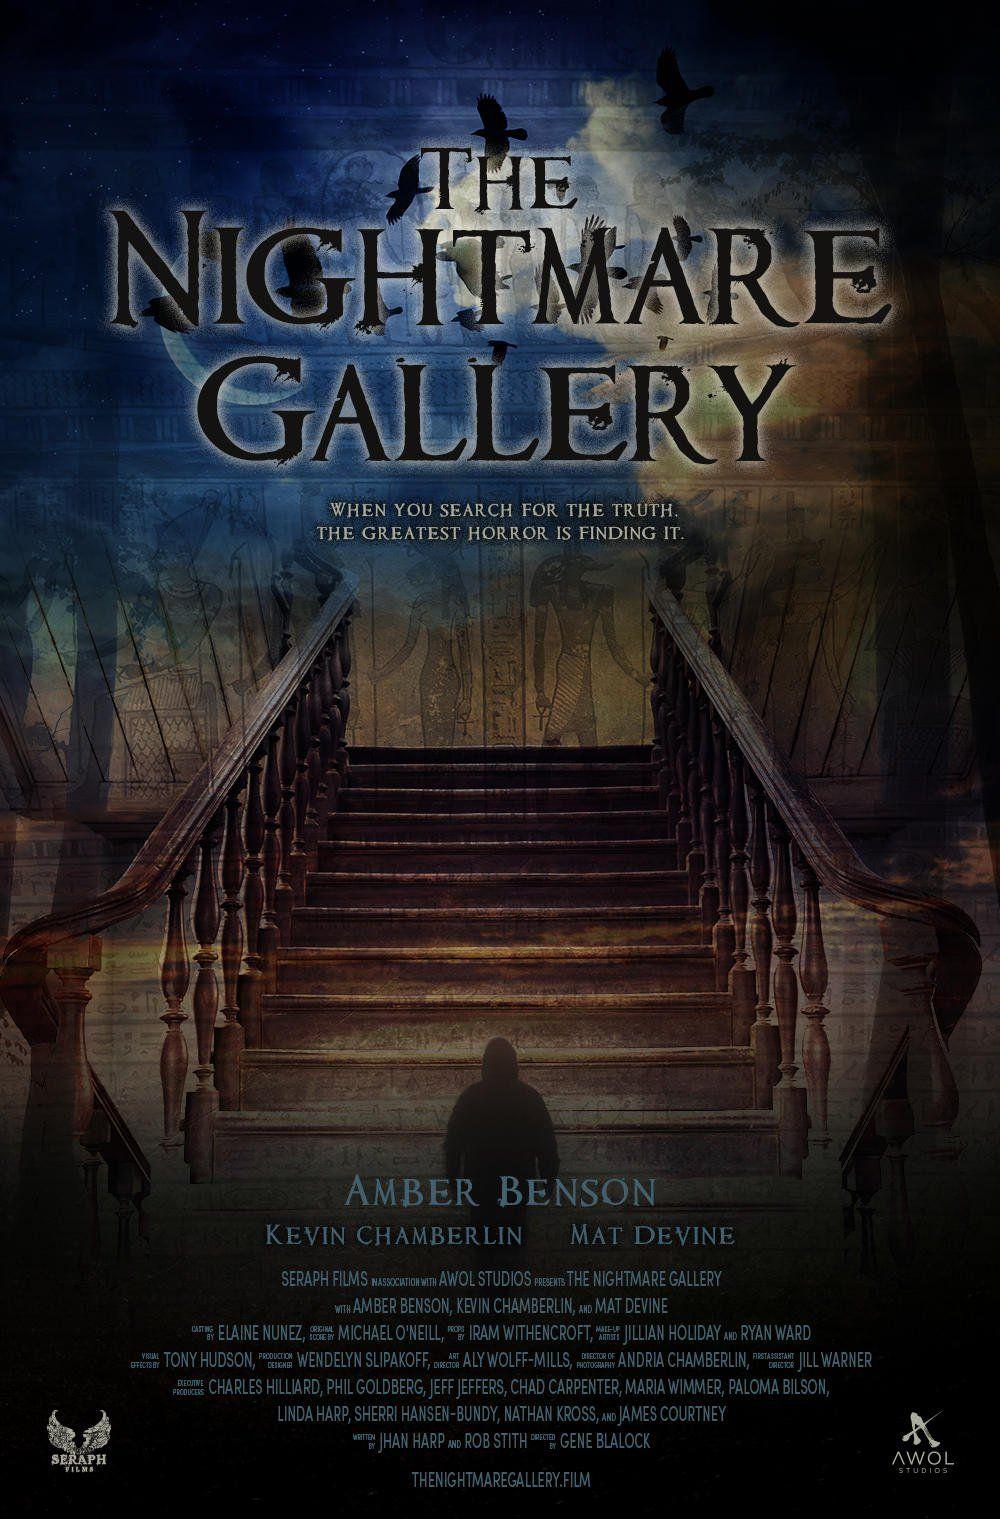 The Nightmare Gallery (2019) Horror, Thriller, Drama Movie